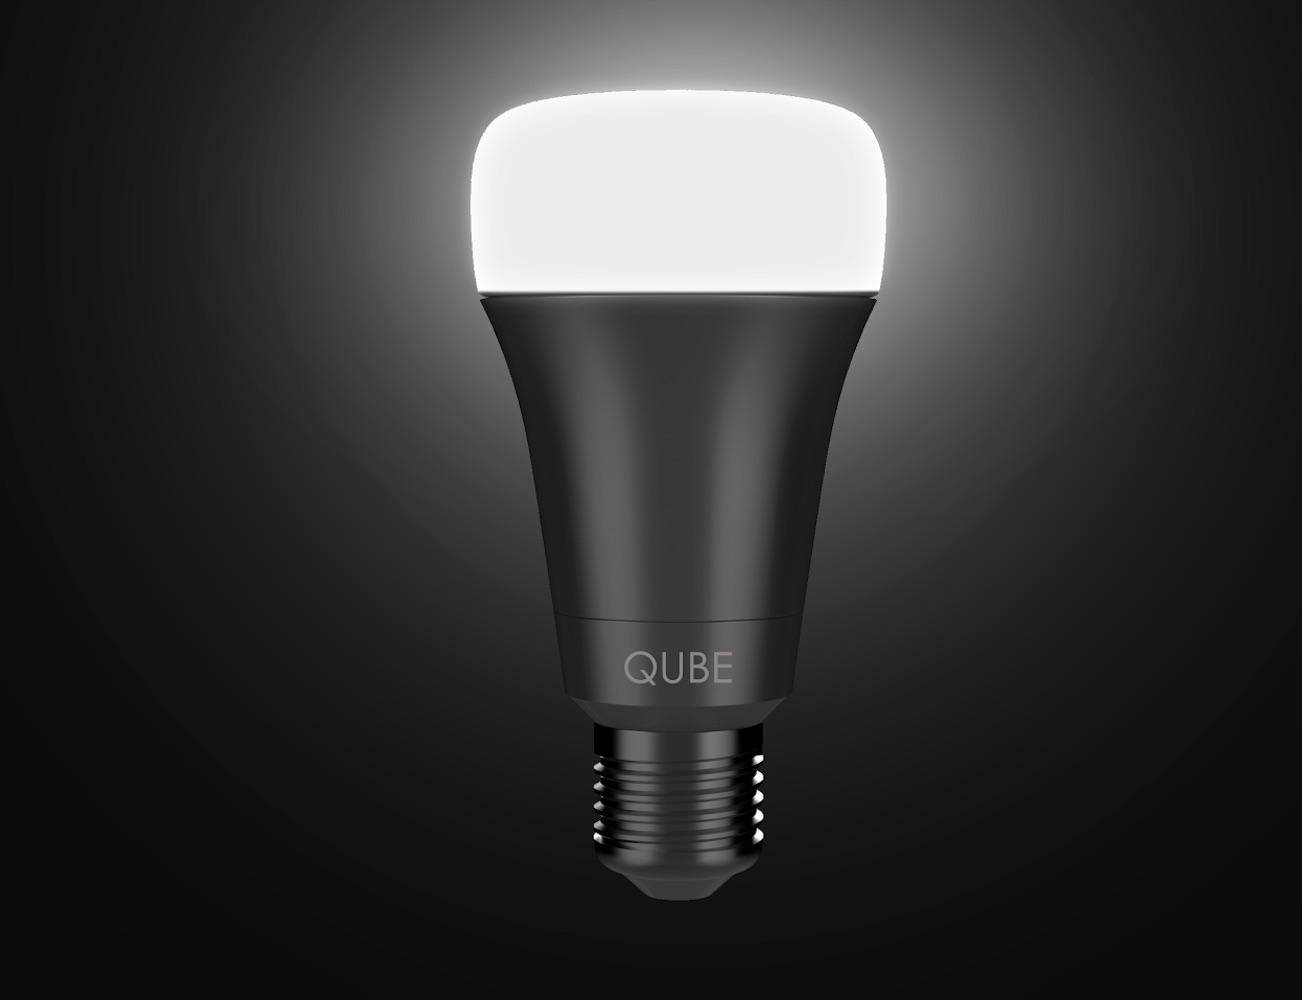 qube world 39 s most affordable wi fi enabled multi color led smart bulb for your home gadget flow. Black Bedroom Furniture Sets. Home Design Ideas